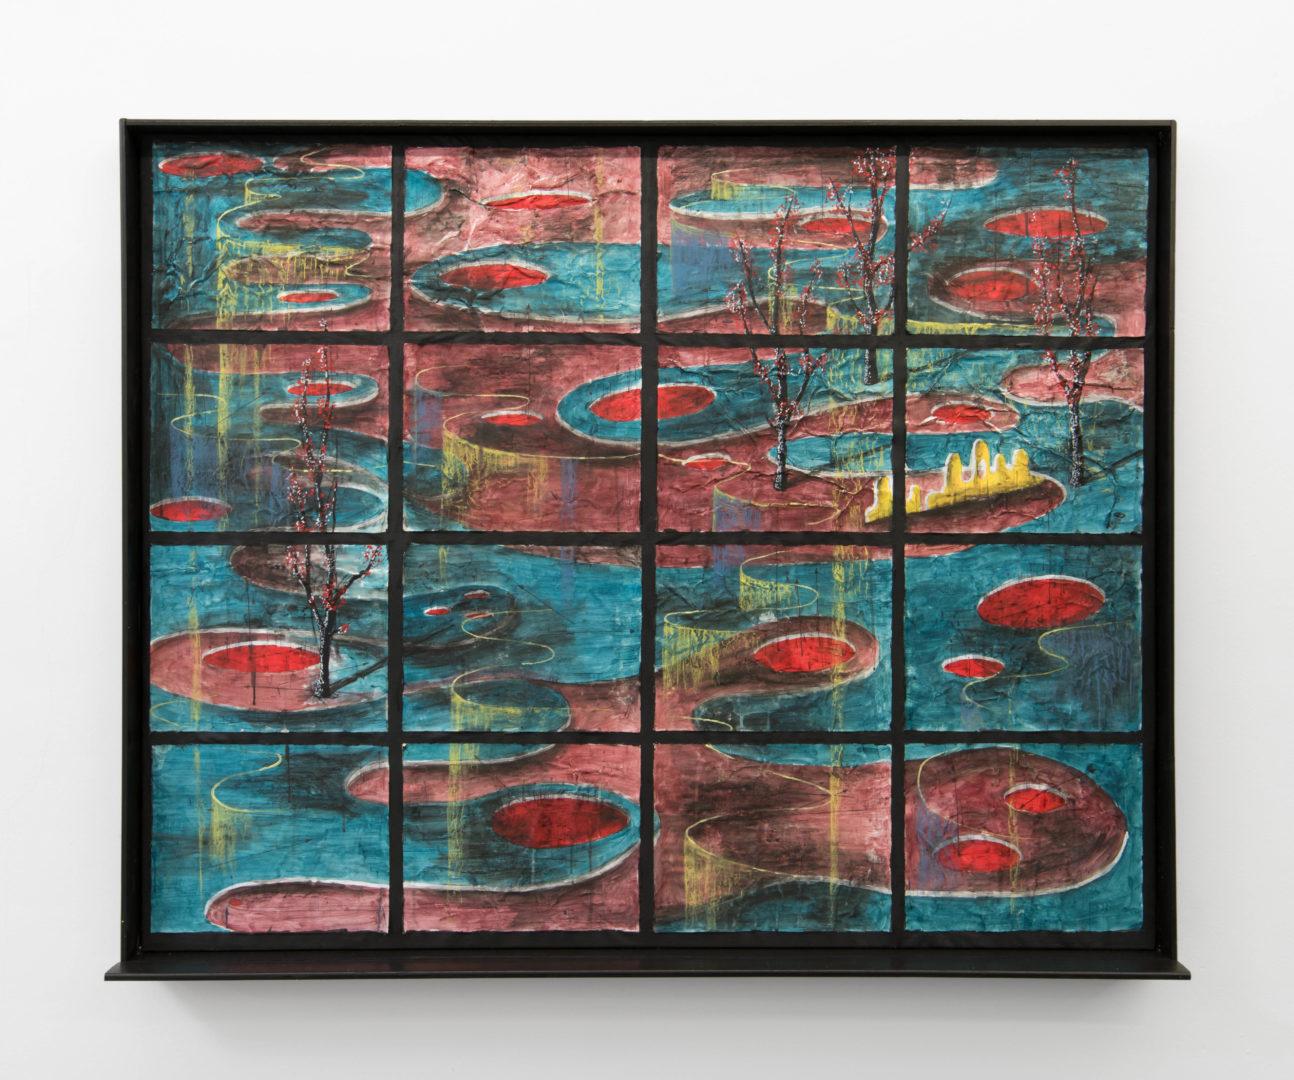 "Exhibition View Veit Laurent Kurz ""Window III (AOA Series), 2018"" at Weiss Falk / Courtesy: Weiss Falk and the artist"